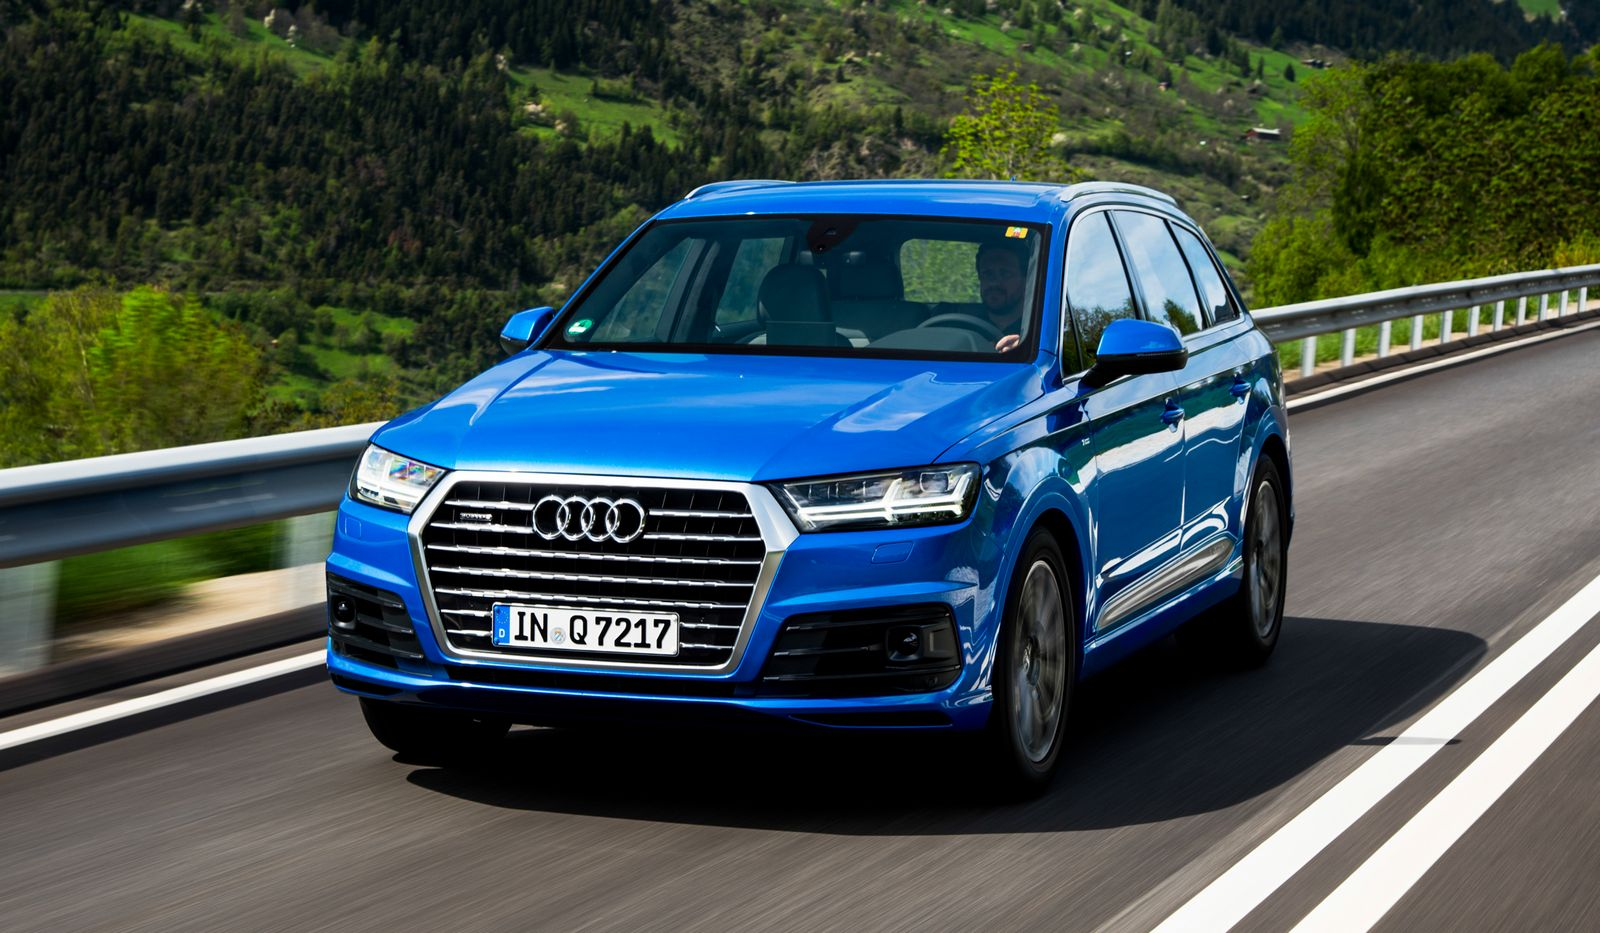 Audi 2016 audi q7 : 2016 Audi Q7 Review - GTspirit